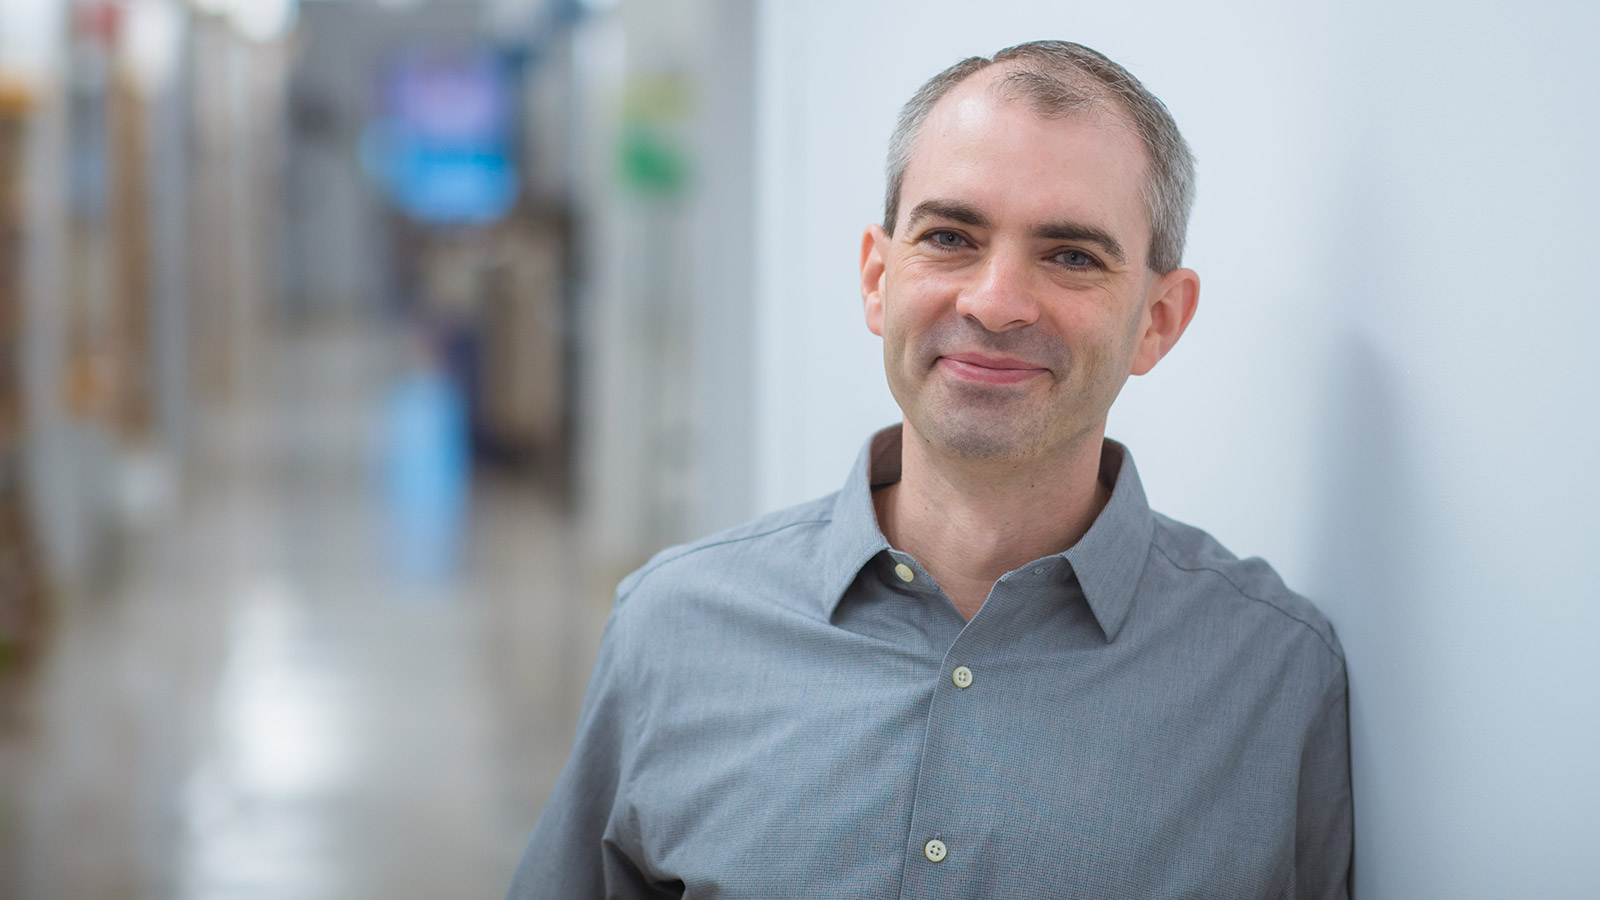 Iain Cheeseman earns a Global Consortium for Reproductive Longevity & Equality (GCRLE) Scholar Award